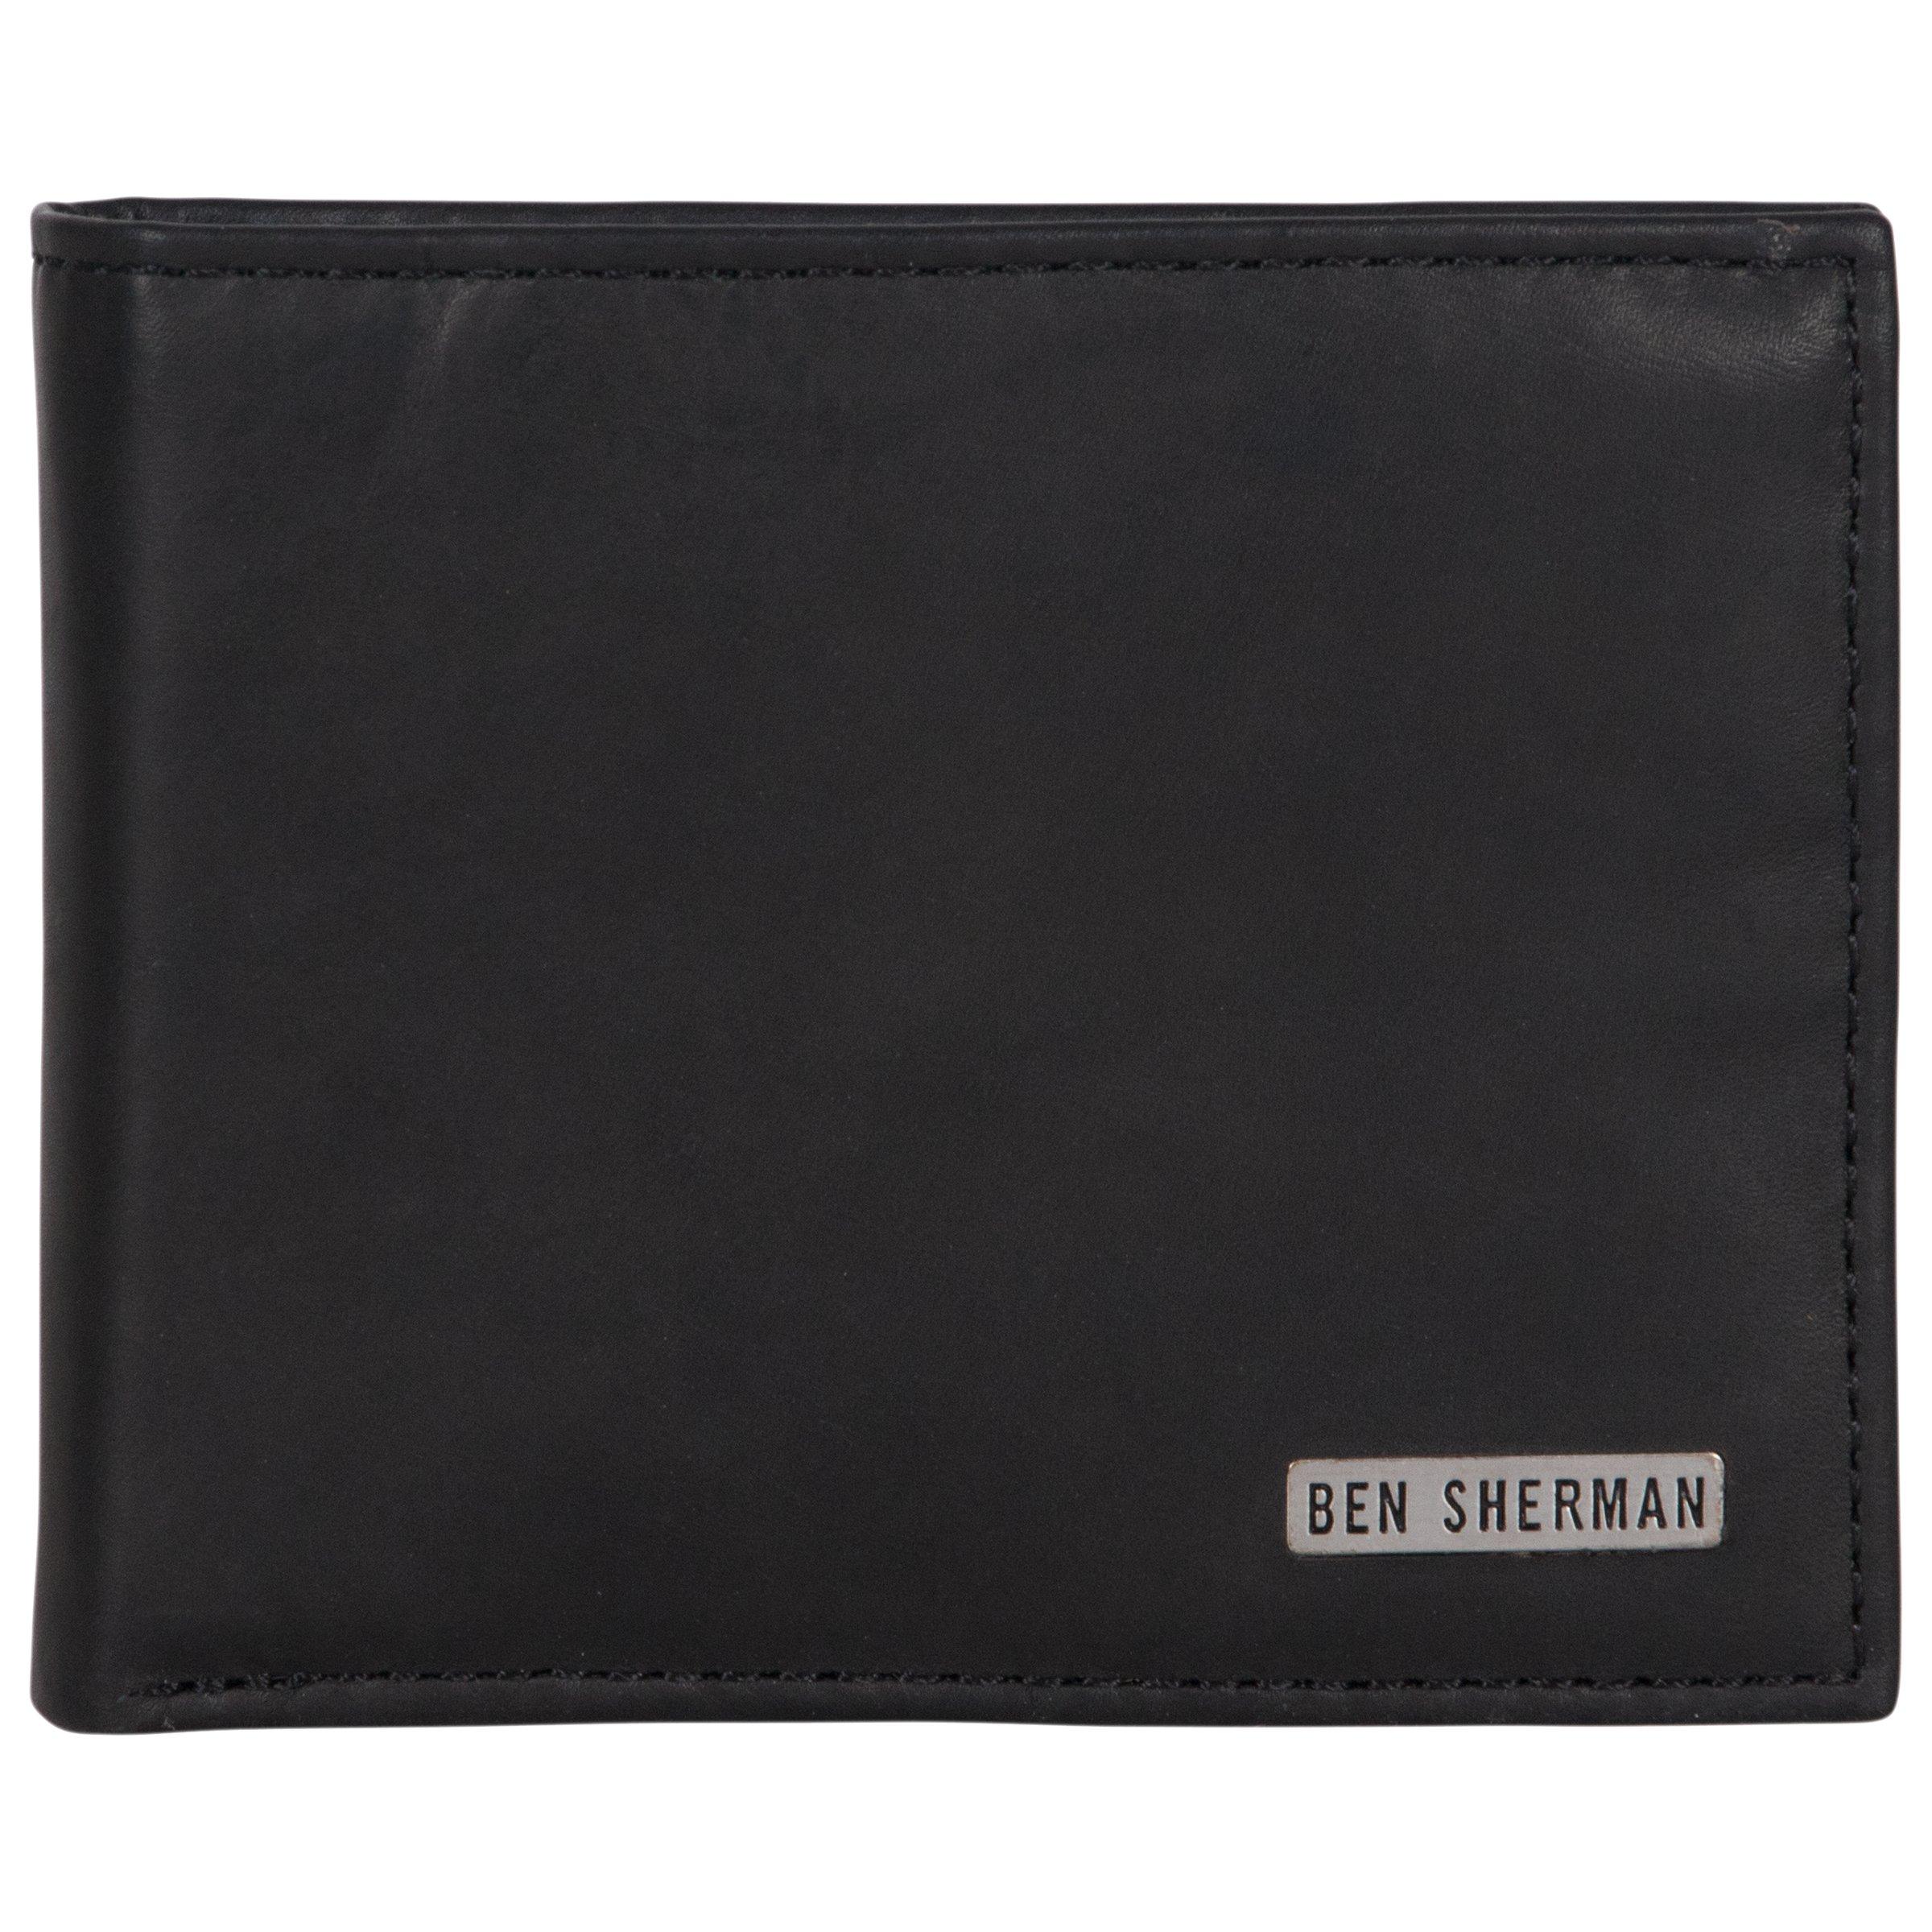 Ben Sherman Men's Leather Nine Pocket Bi-Fold Passcase Wallet with Id Window (Rfid), Black